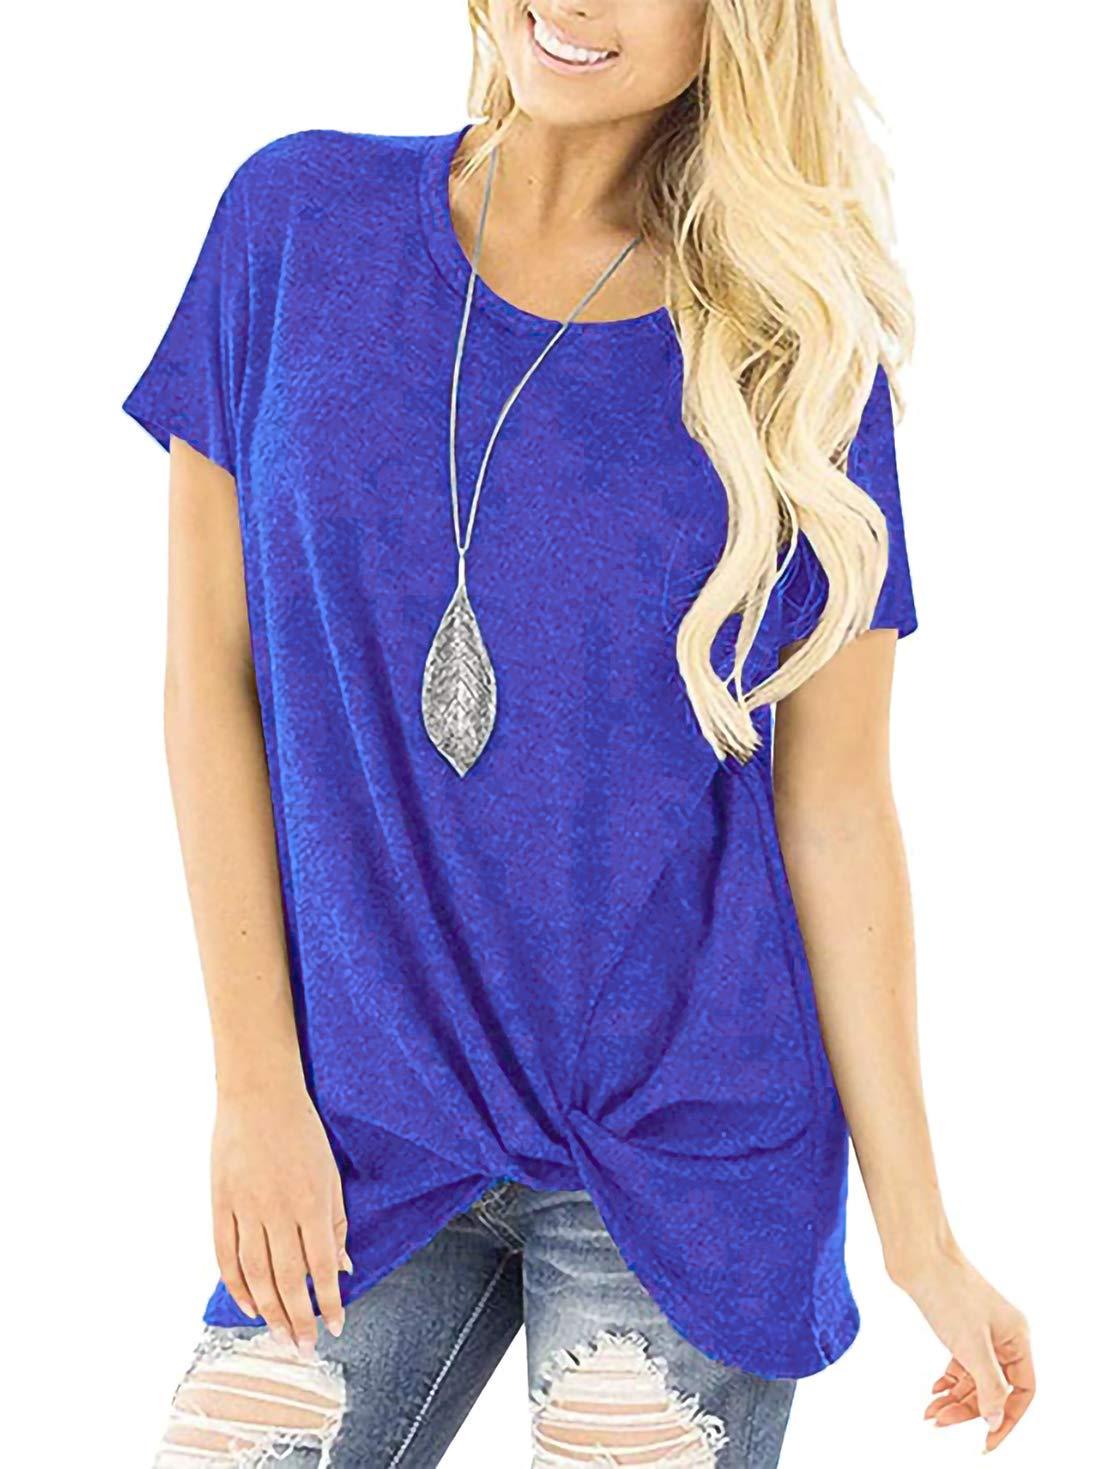 Durzasvo Womens Cute Comfy Front Twist Knot Shirt Summer Long Loose Fit